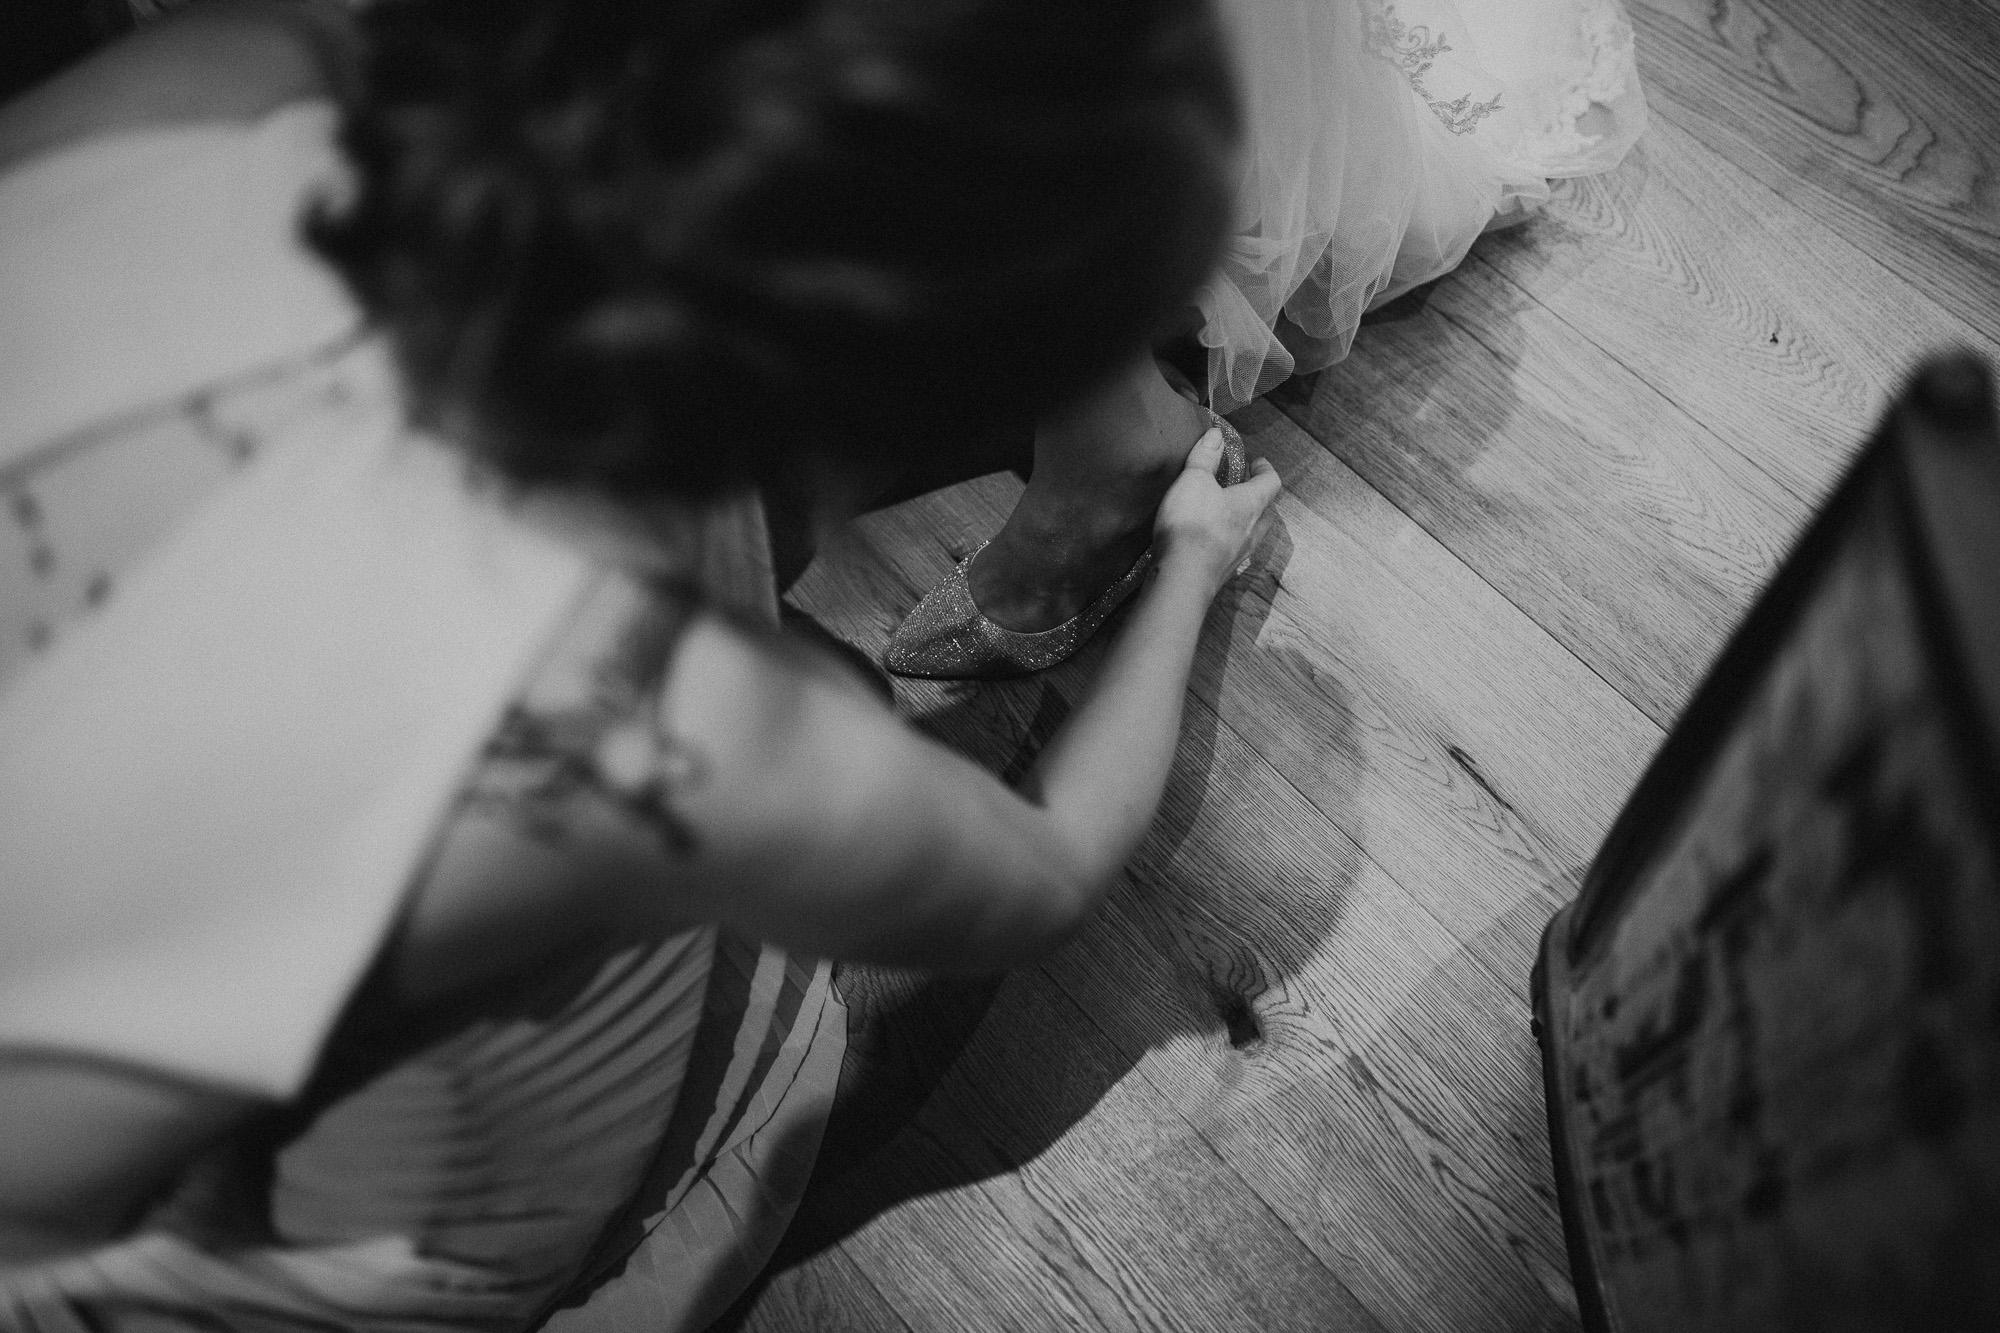 DanielaMarquardtPhotography_Hochzeitsfotograf_Düsseldorf_Köln_Mallorca_Bayern_Austria_Harz_Wedding_AileenundLennart_Weddingphotographer_Ibiza_Tuskany_Italien_Toskana_Portugal_Lissabon48